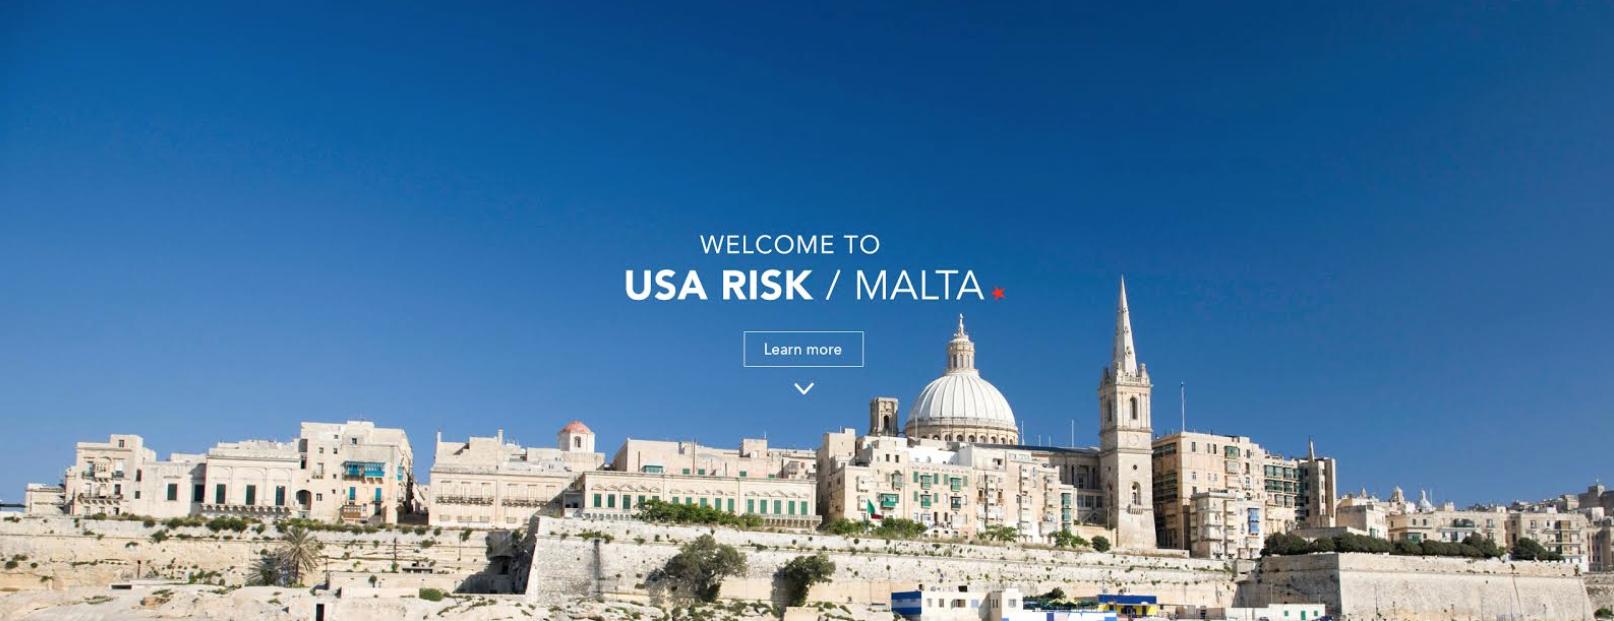 USA Risk Malta Captive Insurance.png